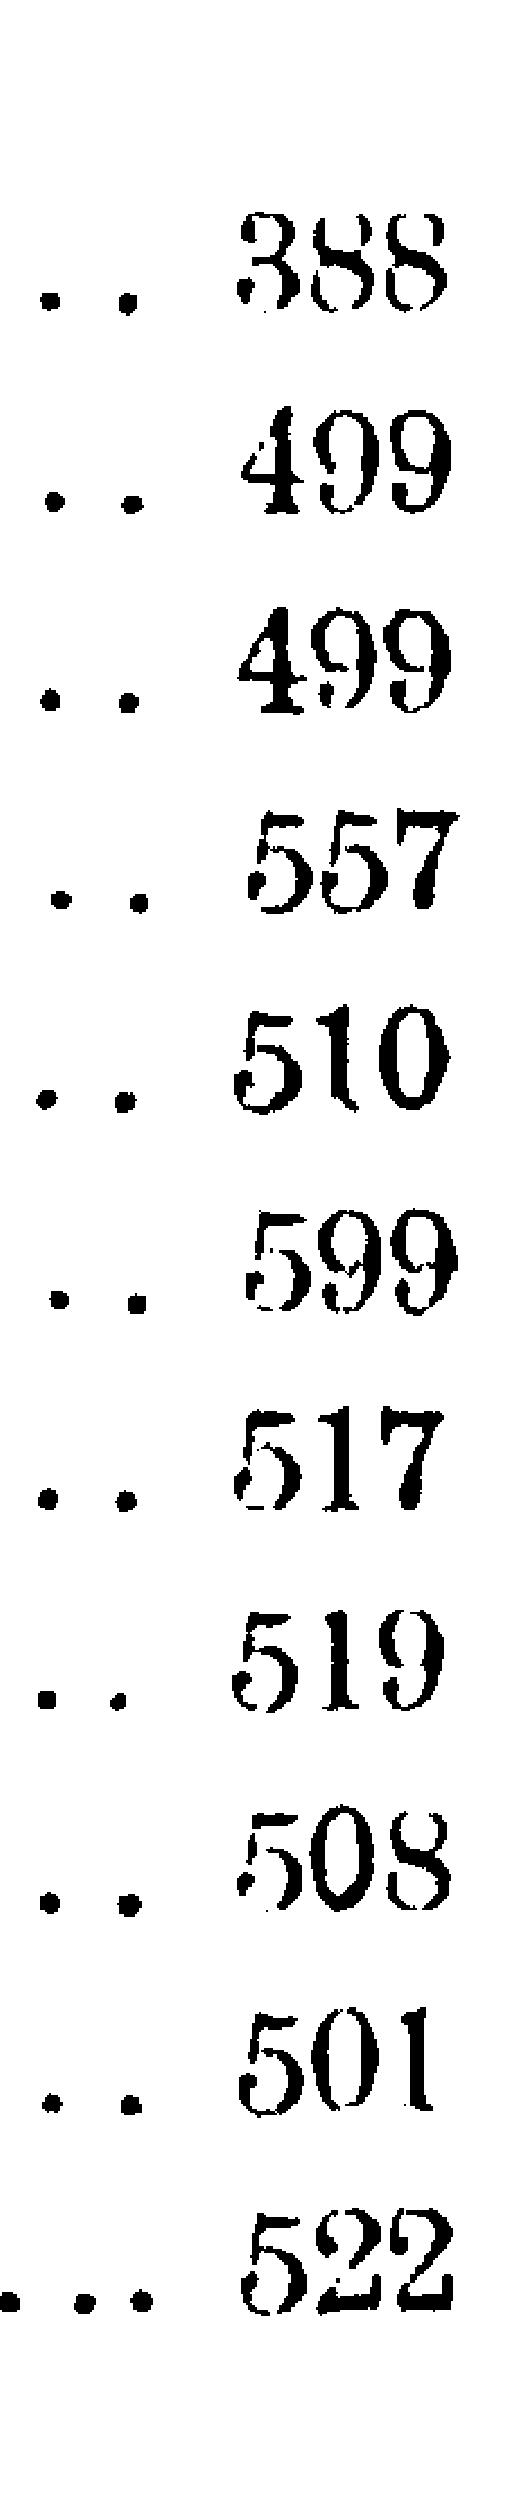 [merged small][merged small][merged small][merged small][merged small][merged small][merged small][merged small][merged small][ocr errors][merged small][merged small]